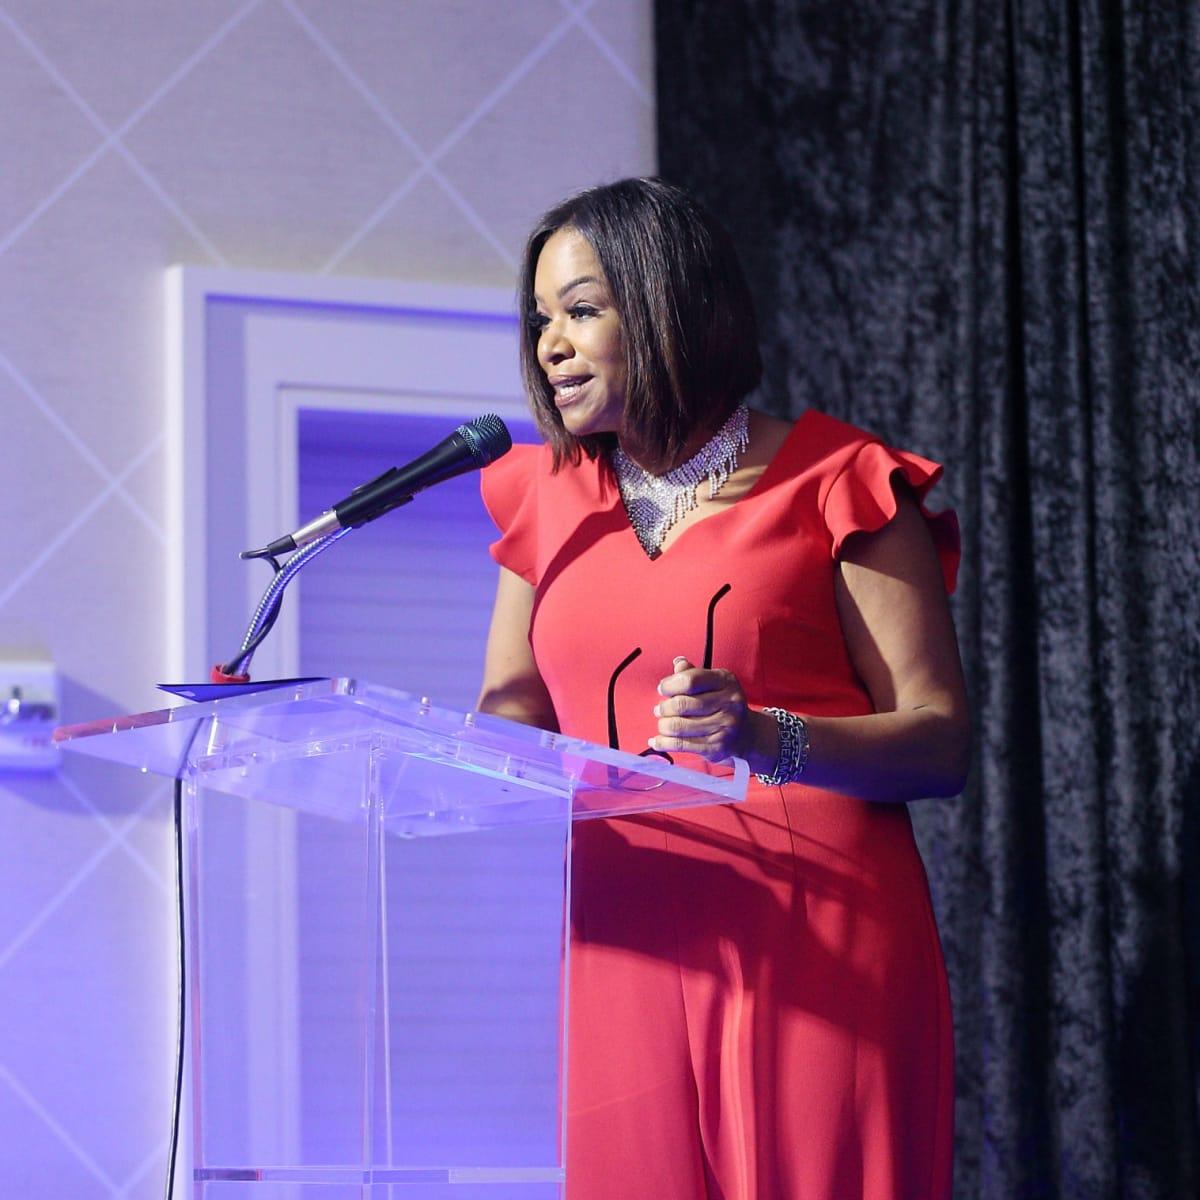 Deborah Duncan at podium